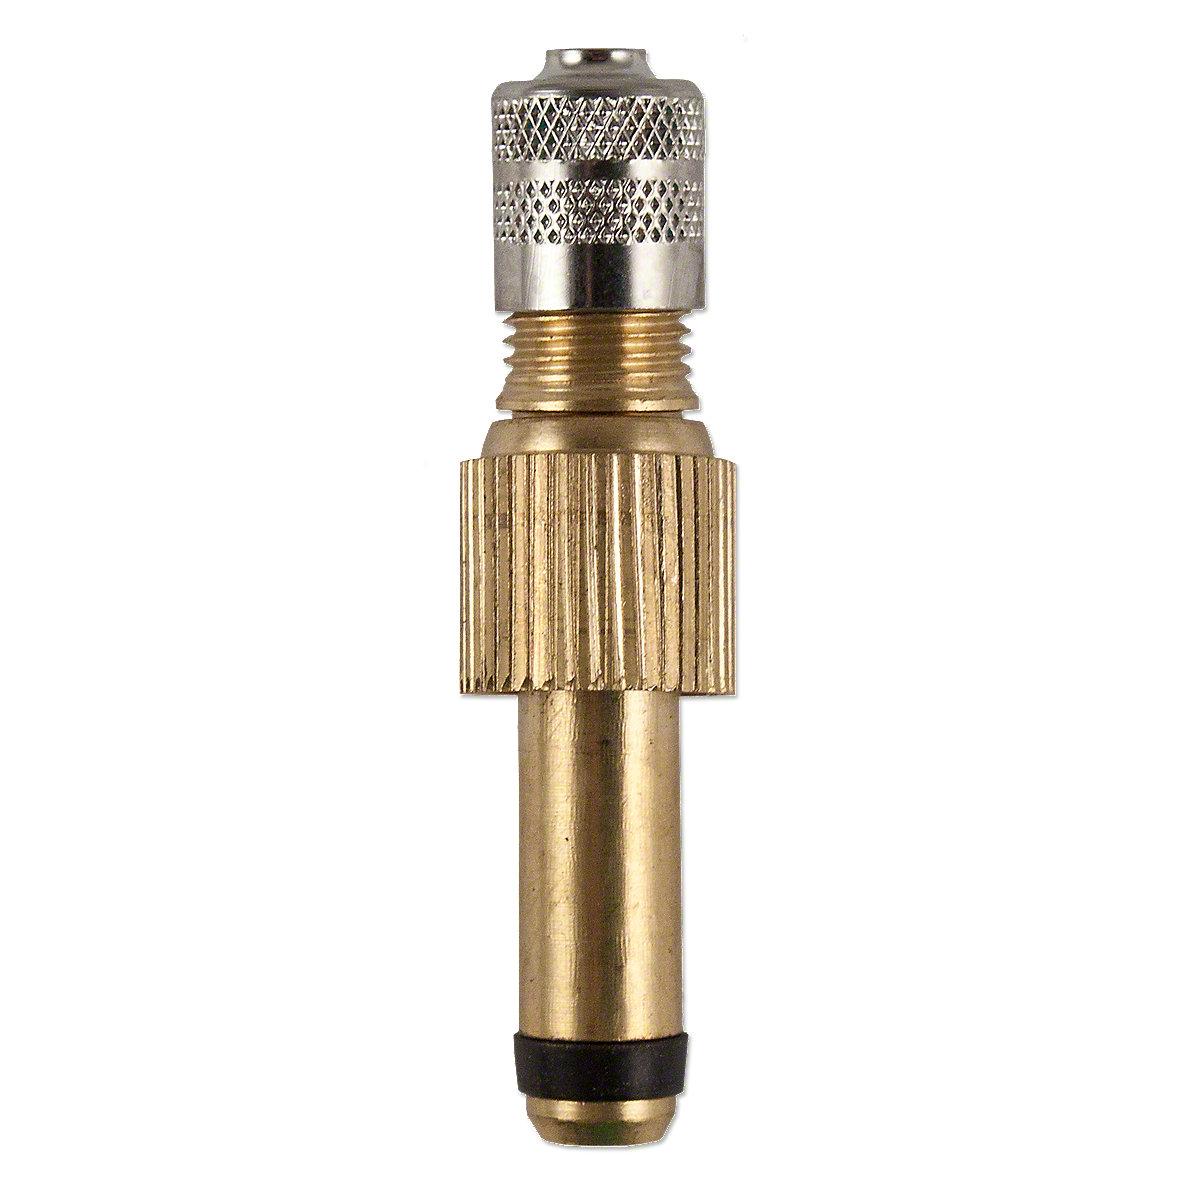 ABC384Rear Tire Inner Tube Air/water valve